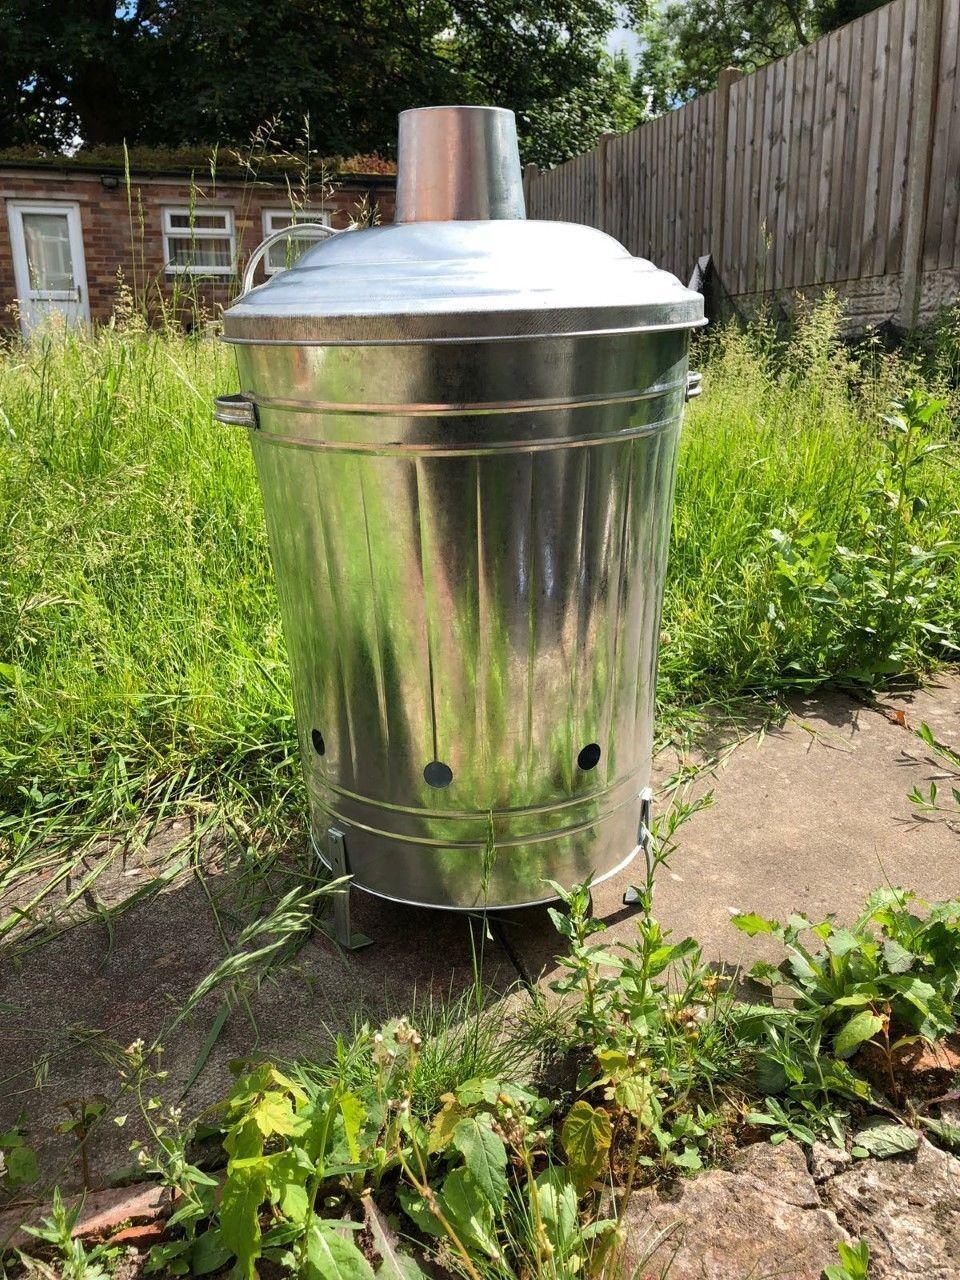 Garden incinerator 55L Bin Galvanised waste Burning Rubbish PAPER FIRE BIN